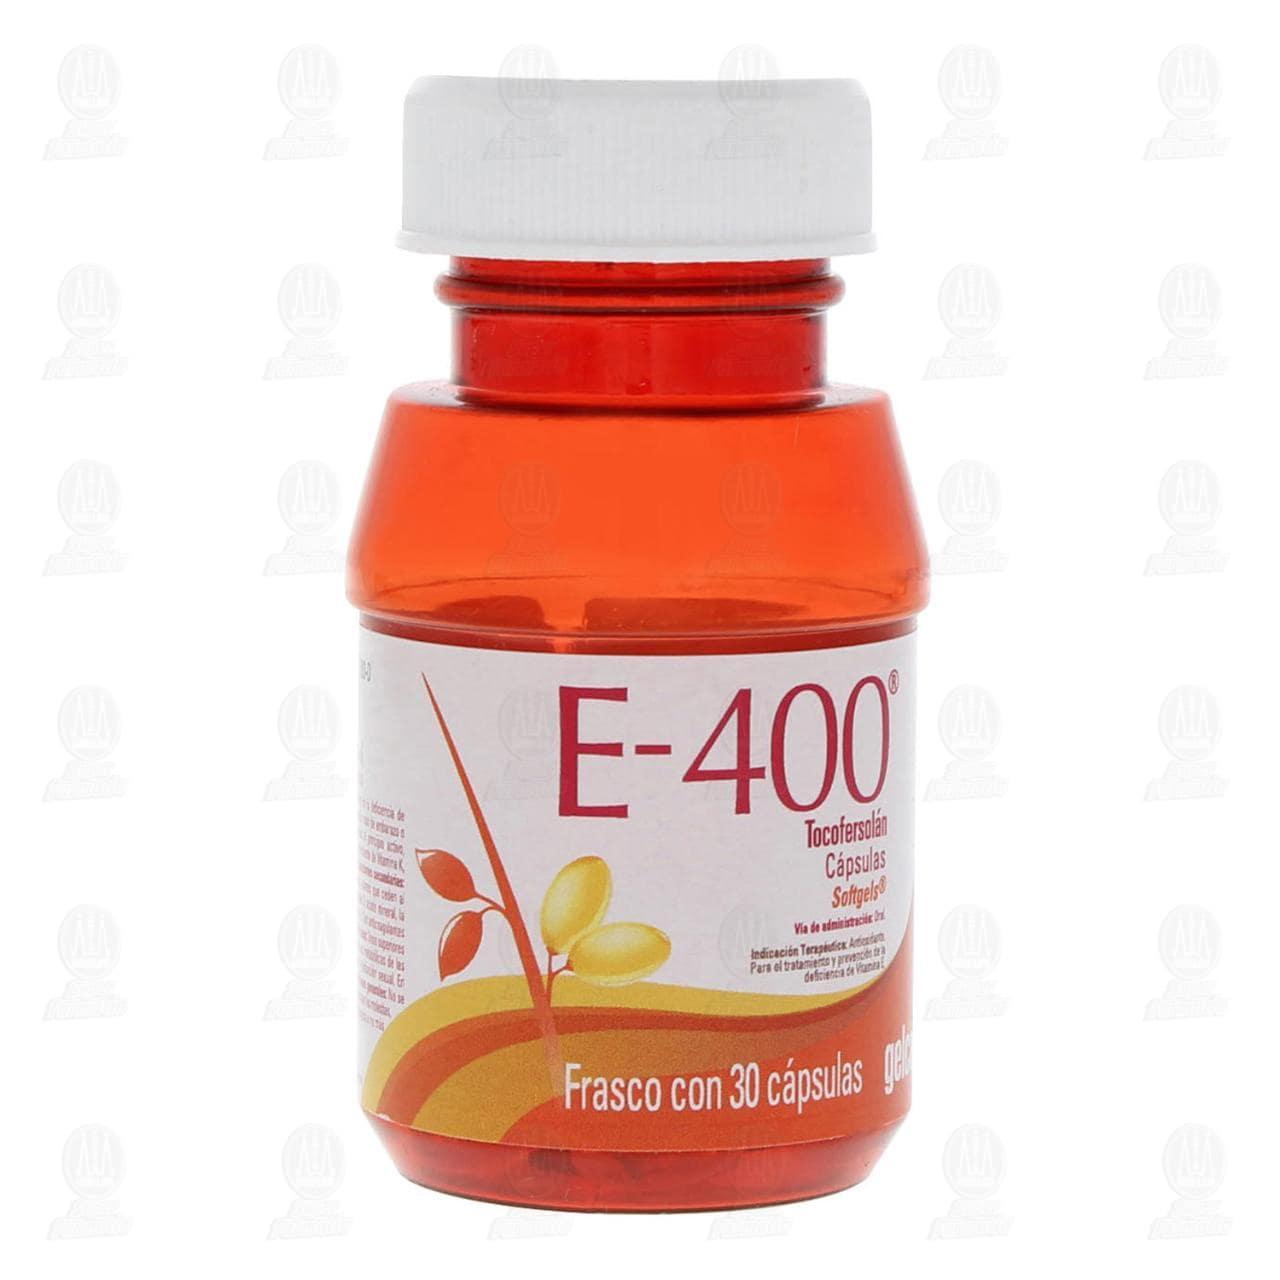 Comprar Vitamina E-400 Gelcaps 30 Cápsulas en Farmacias Guadalajara